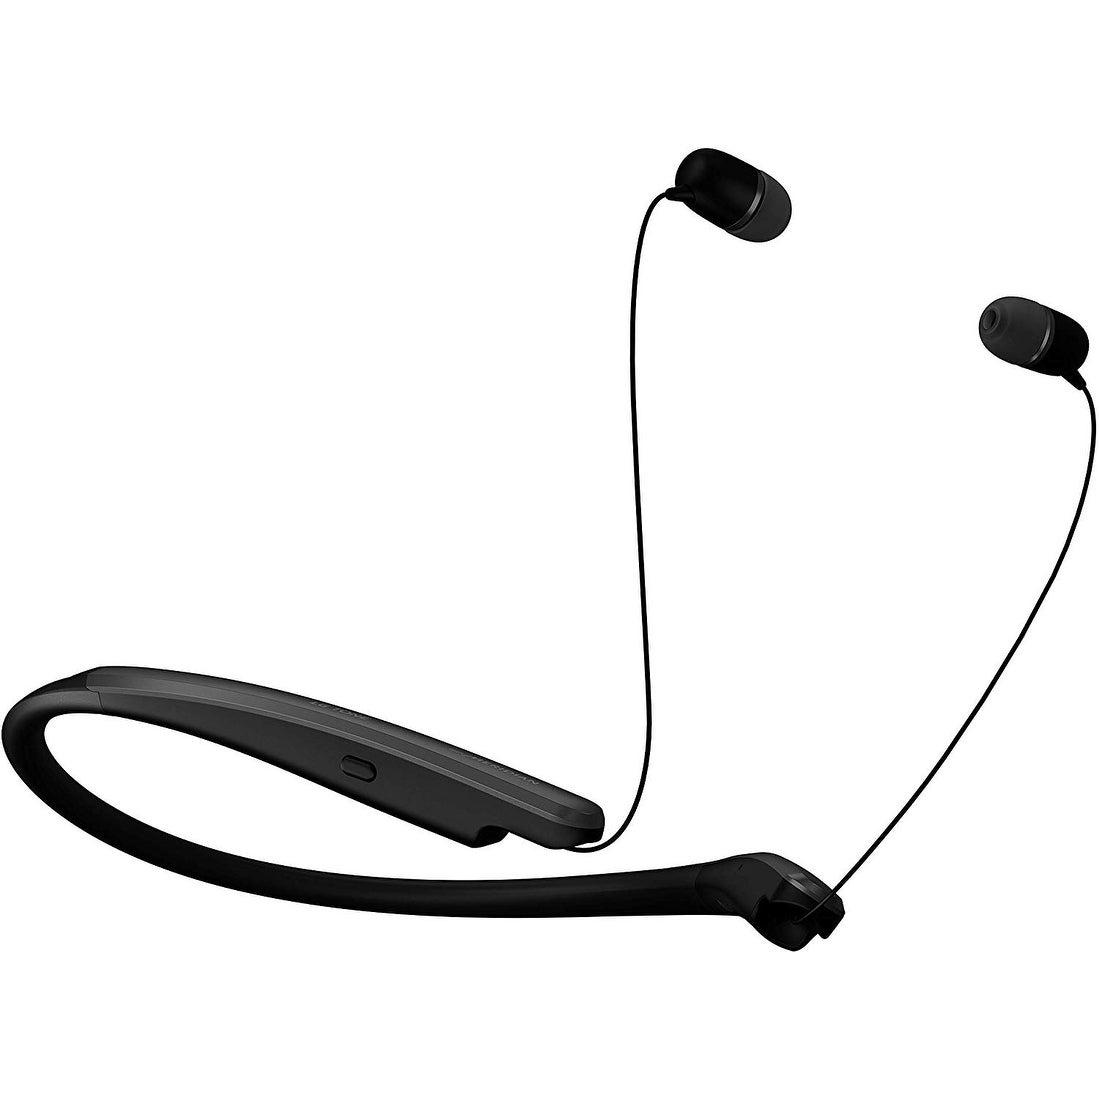 Shop Lg Tone Flex Xl7 Bluetooth Wireless Stereo Headset 32 Bit Hi Fi Upscaling Retractable Earbuds Hbs Xl7 Black Overstock 29821853